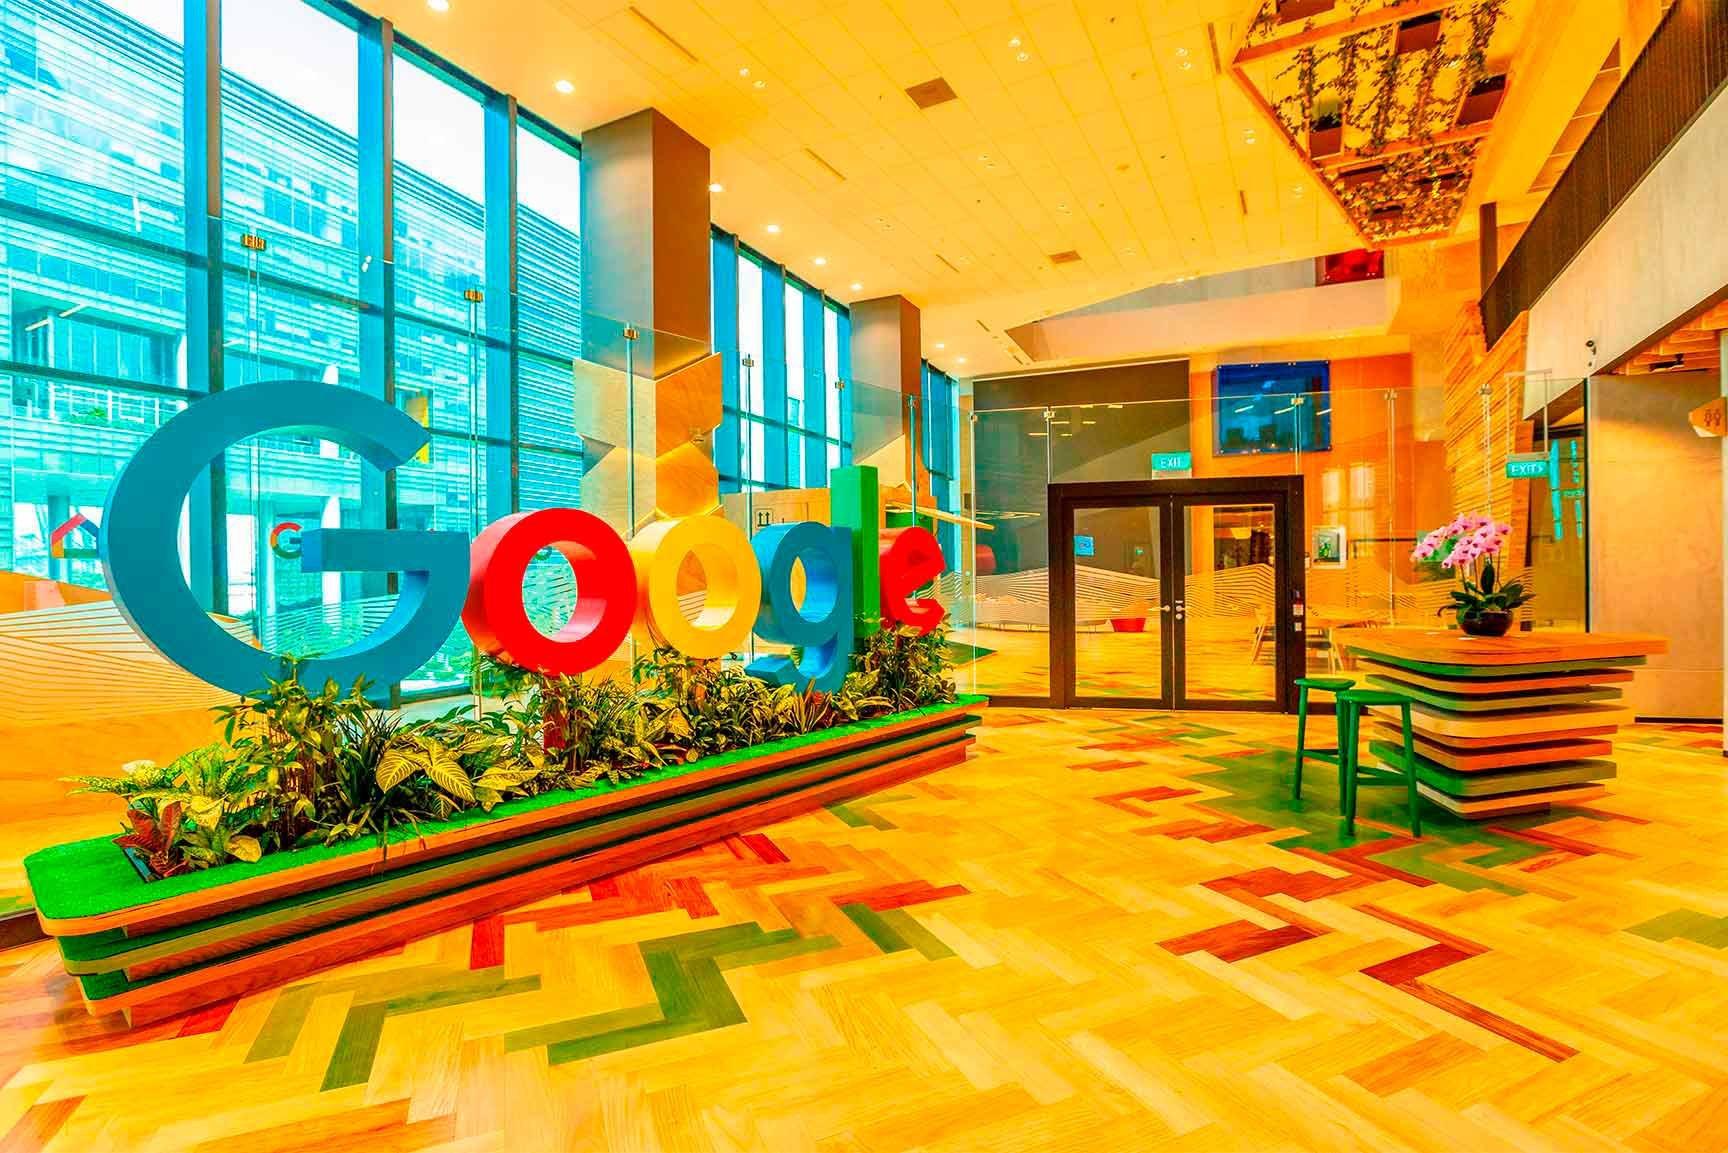 h_google.jpg